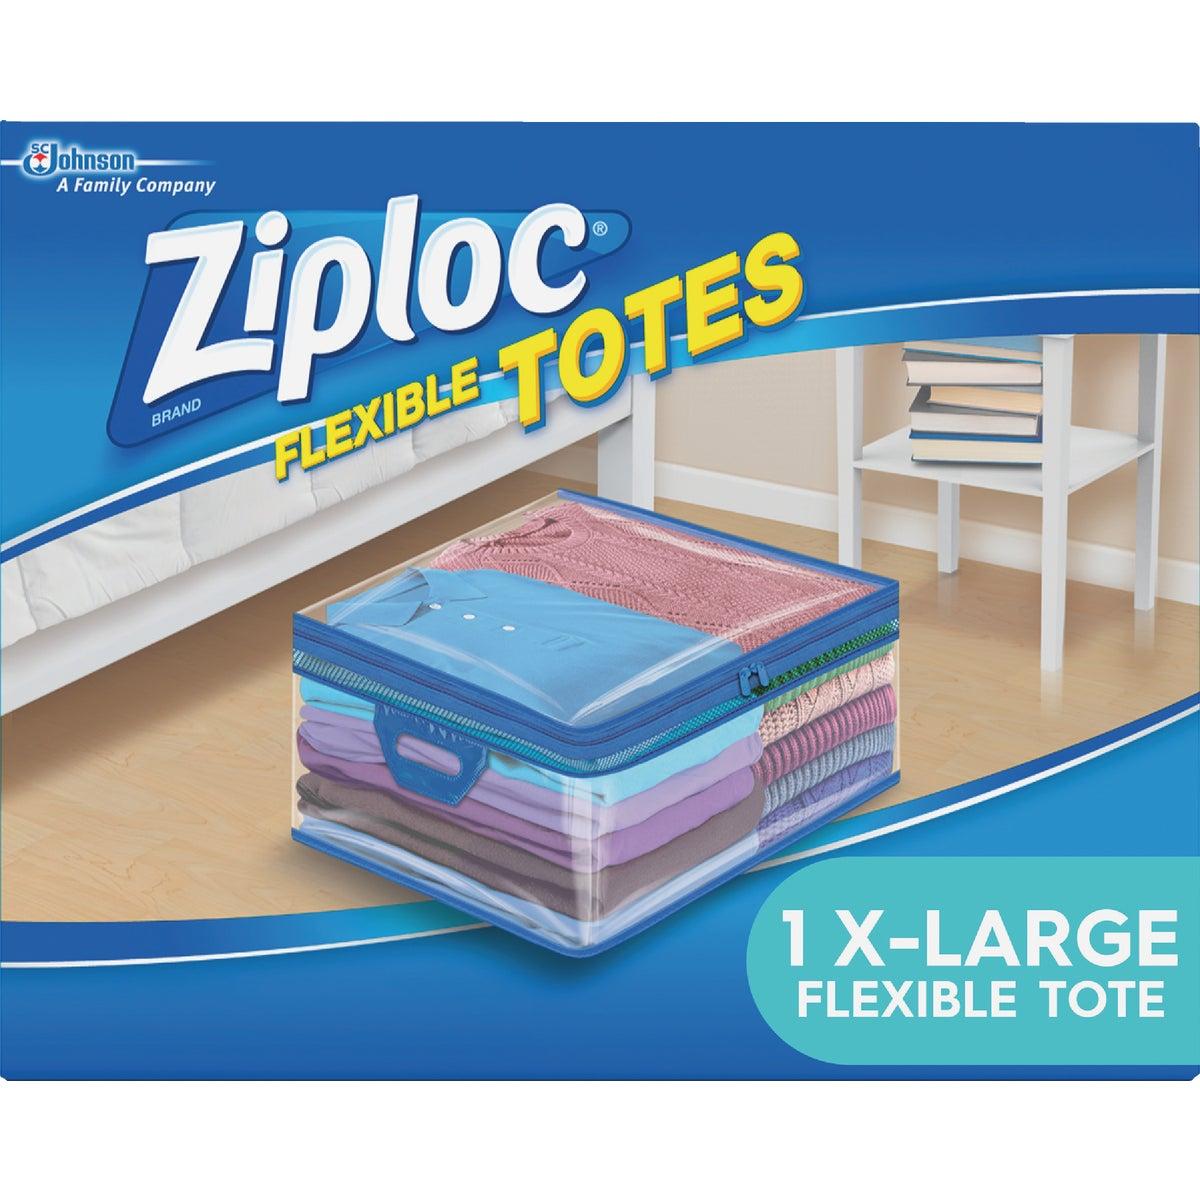 XL ZIPLOC FLEX TOTE - 70161 by Sc Johnson